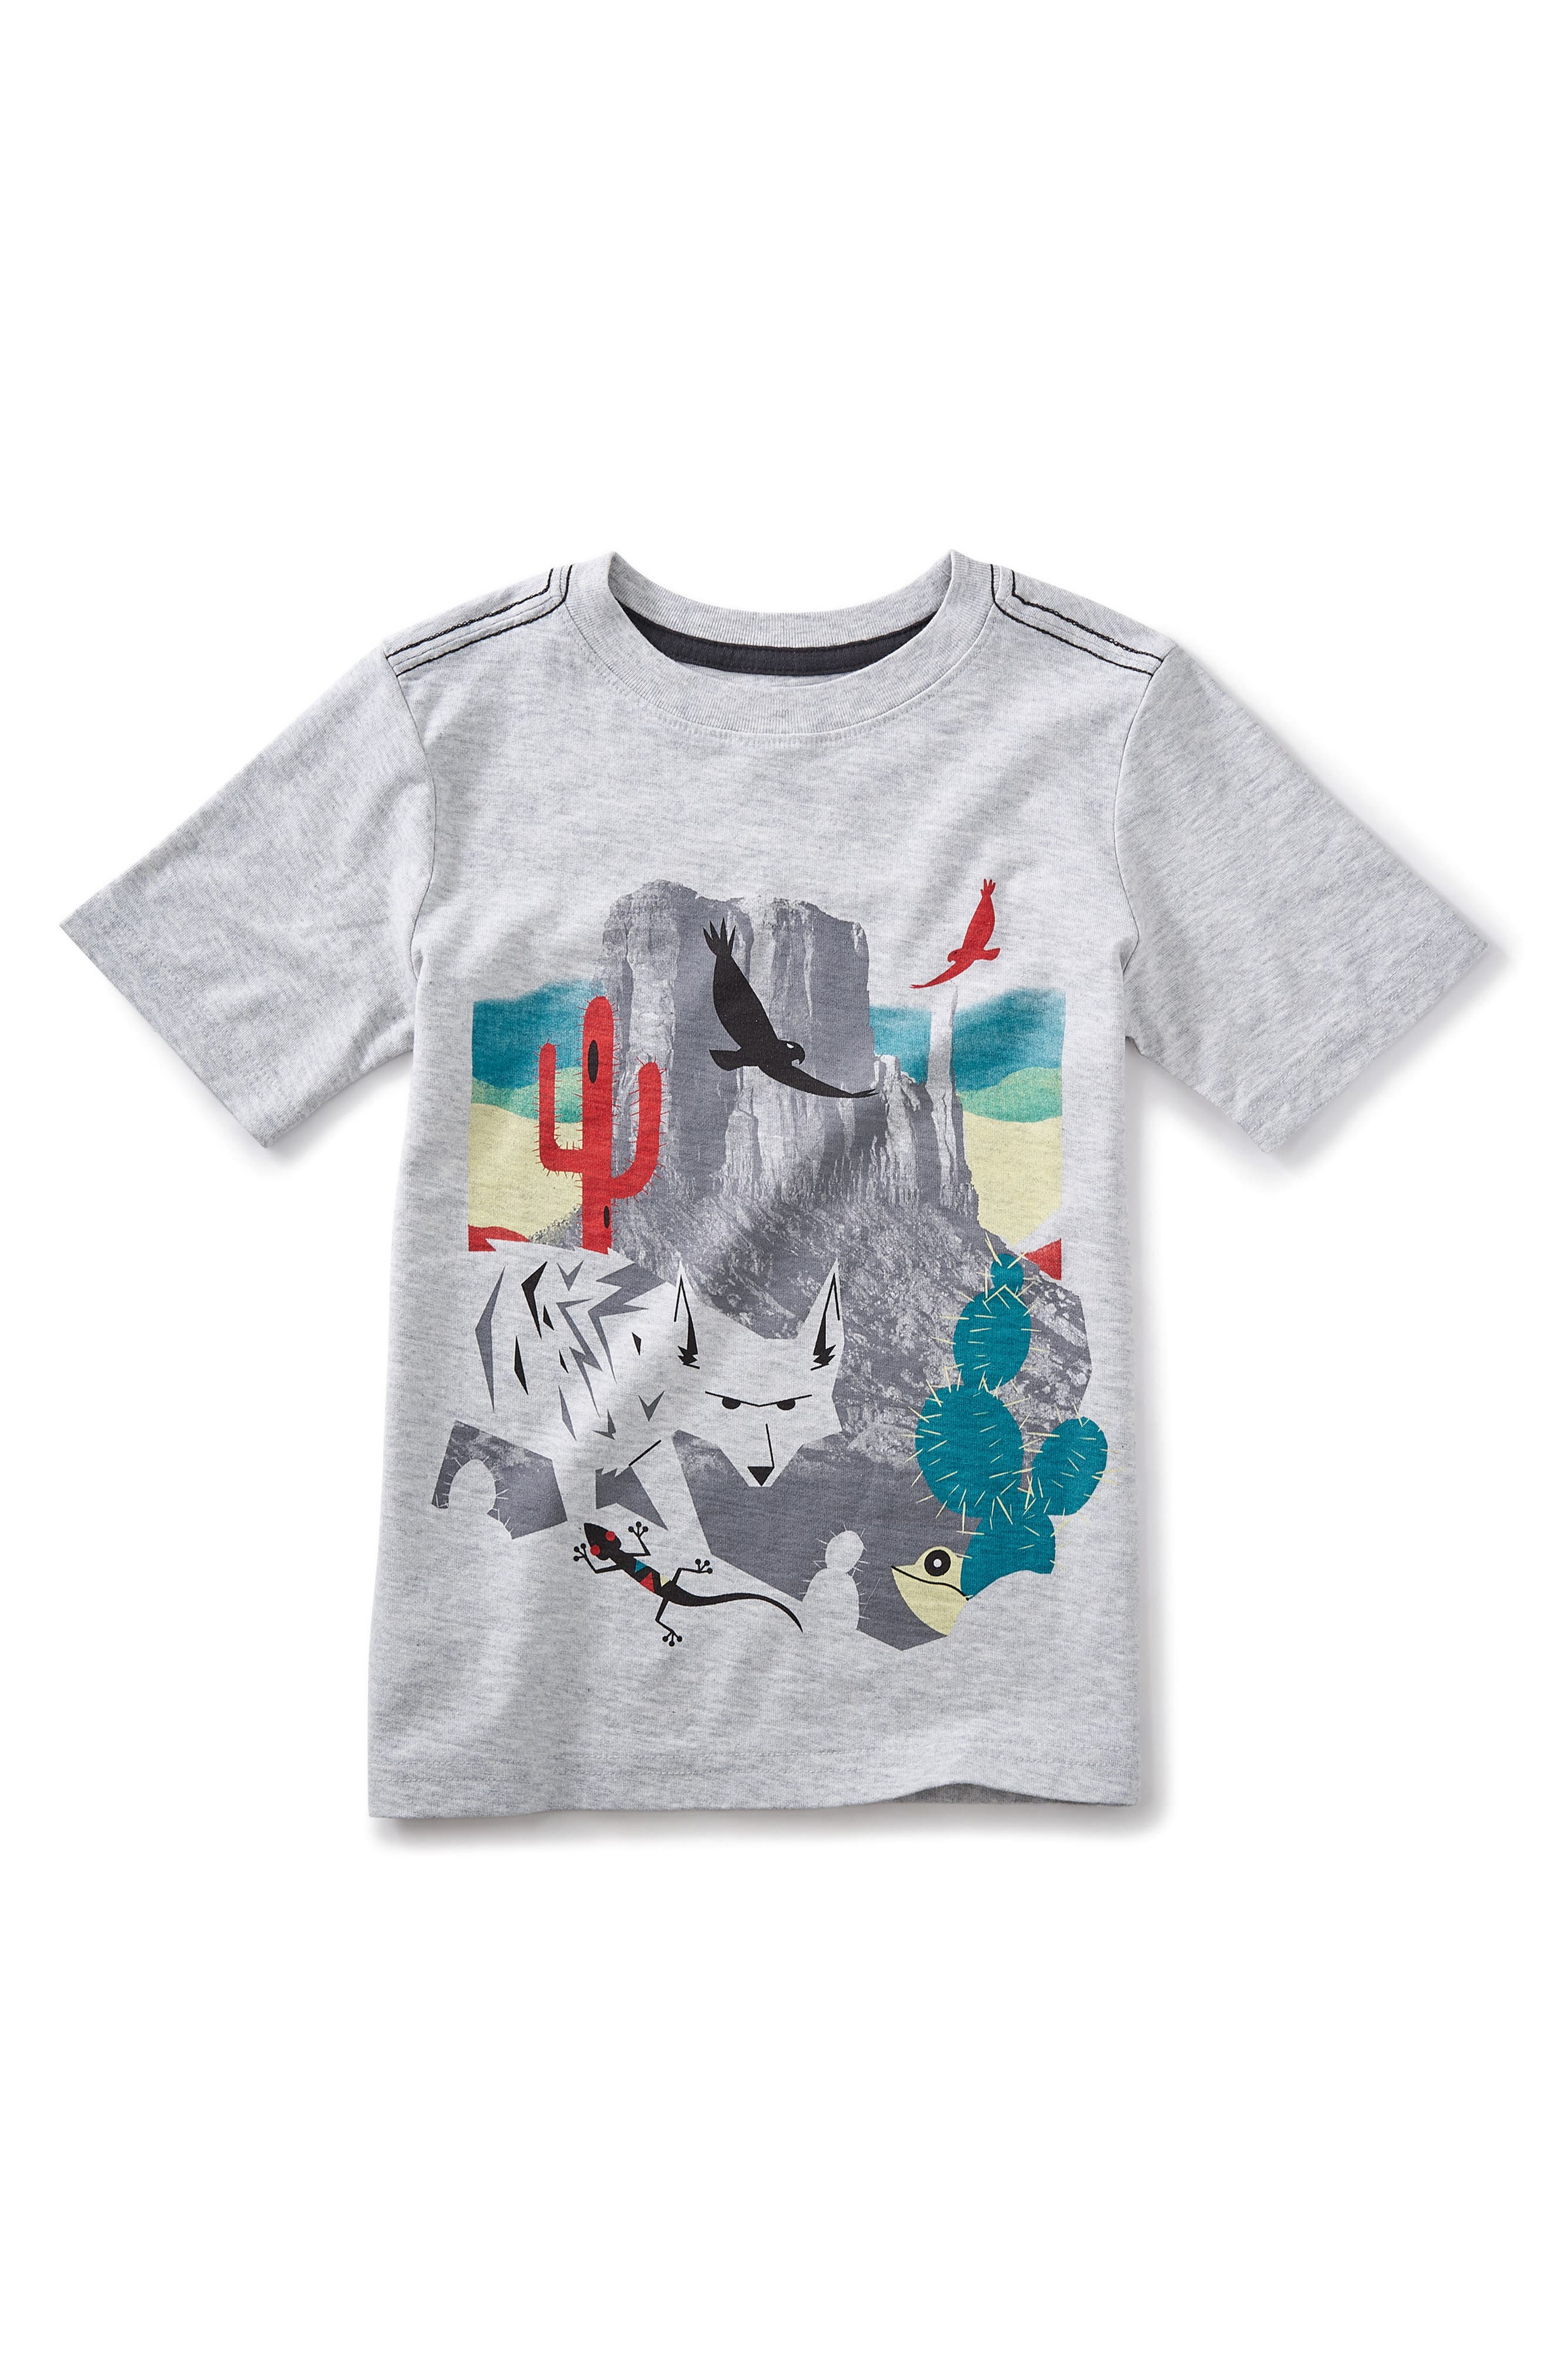 Canyon Lands Graphic T-Shirt,                             Main thumbnail 1, color,                             Light Grey Heather